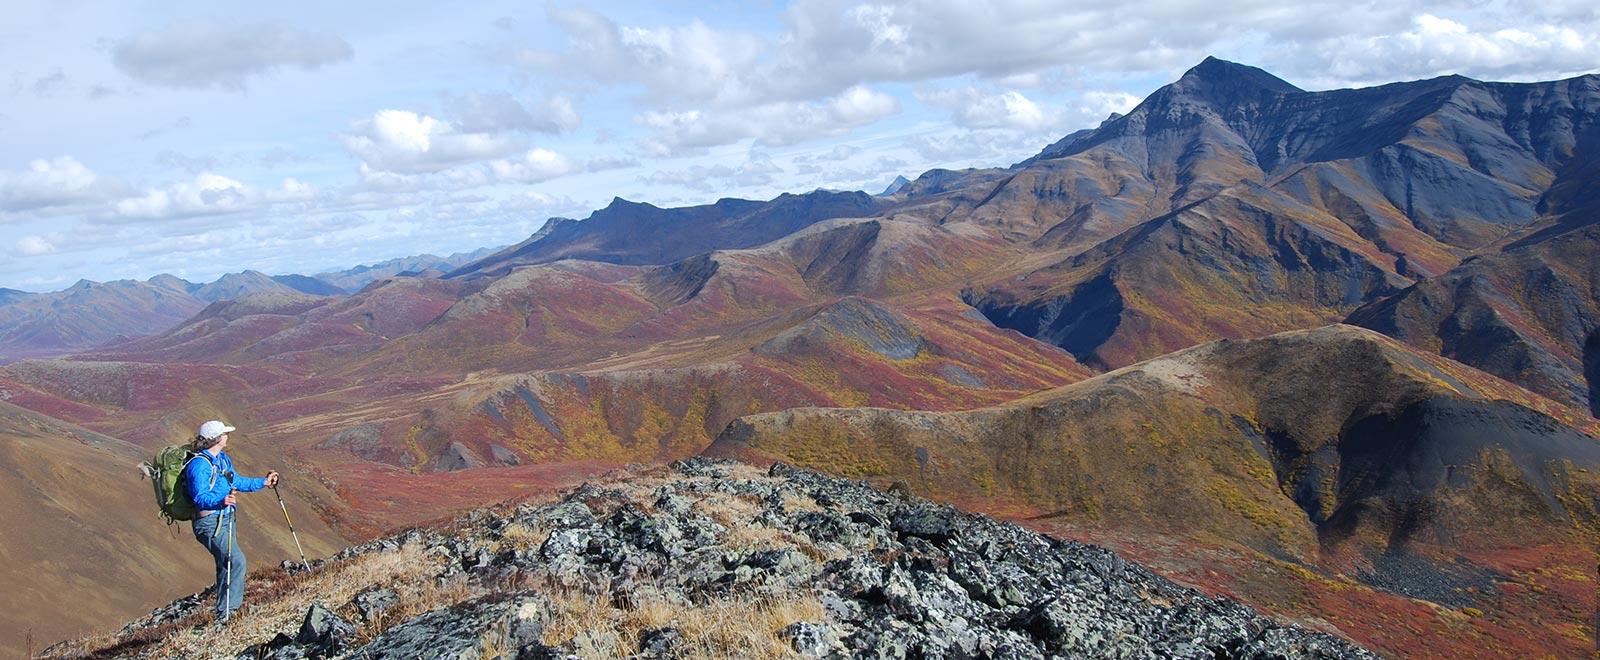 hiking-with-view-yukon-slide